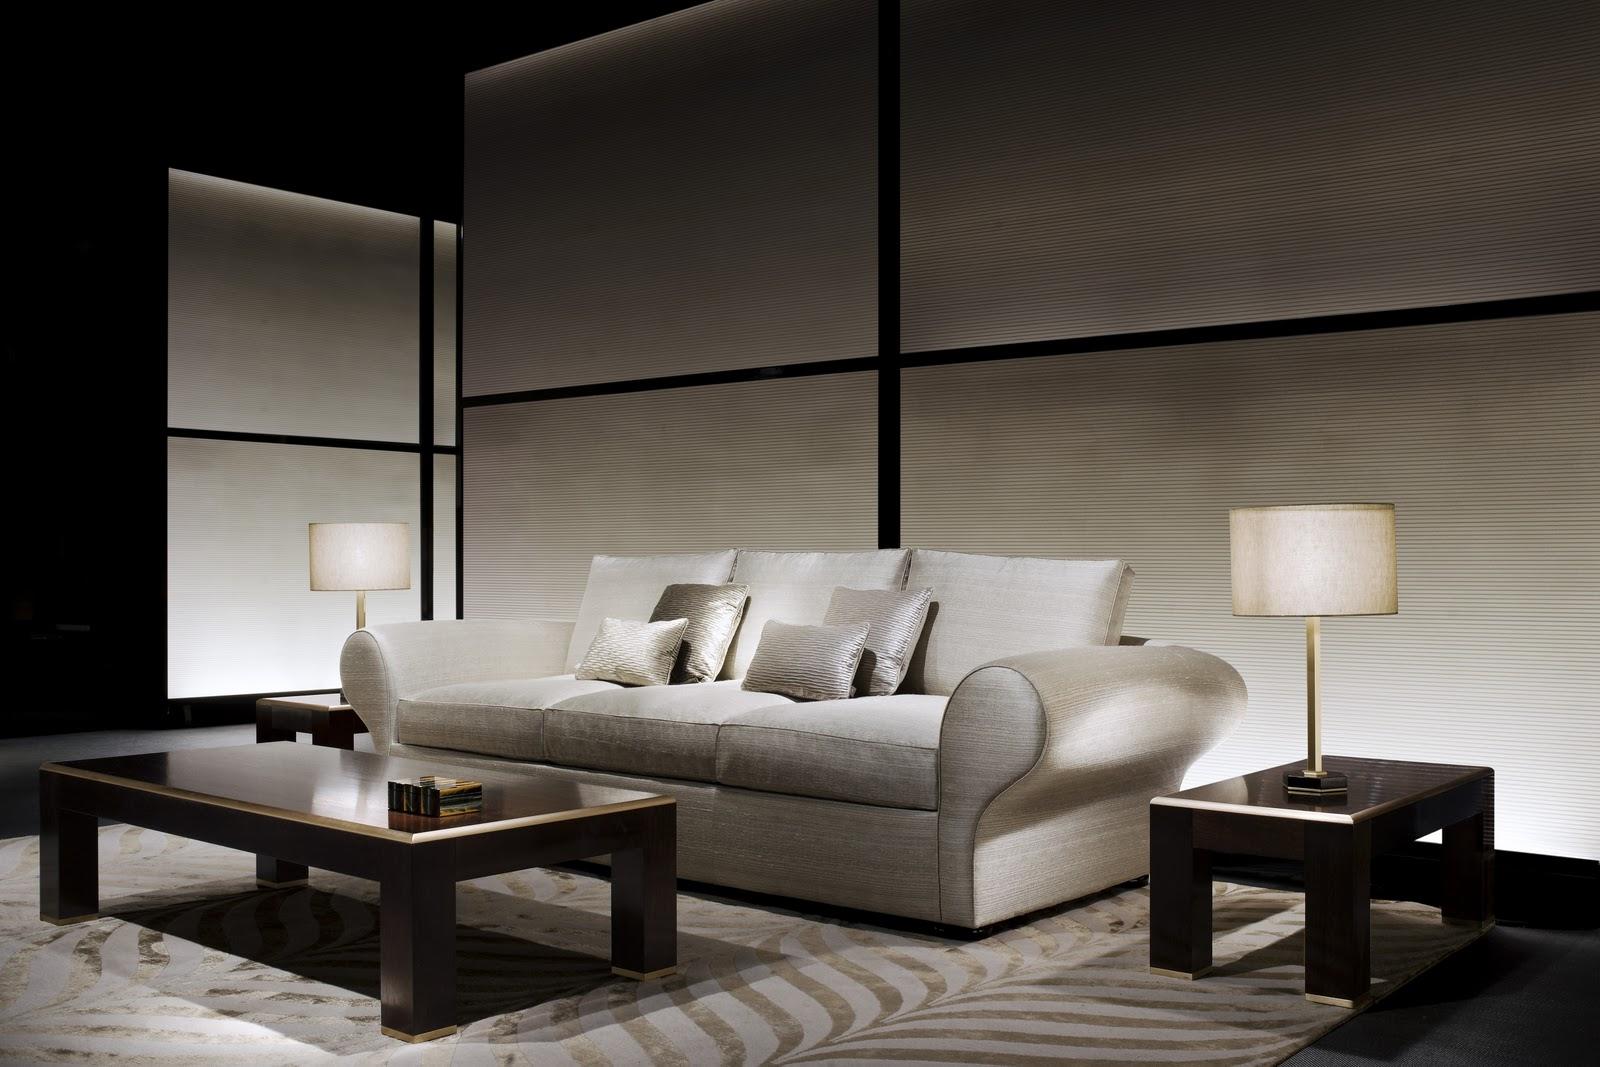 sofa shops chelsea harbour cream leather uk light color design armani casa